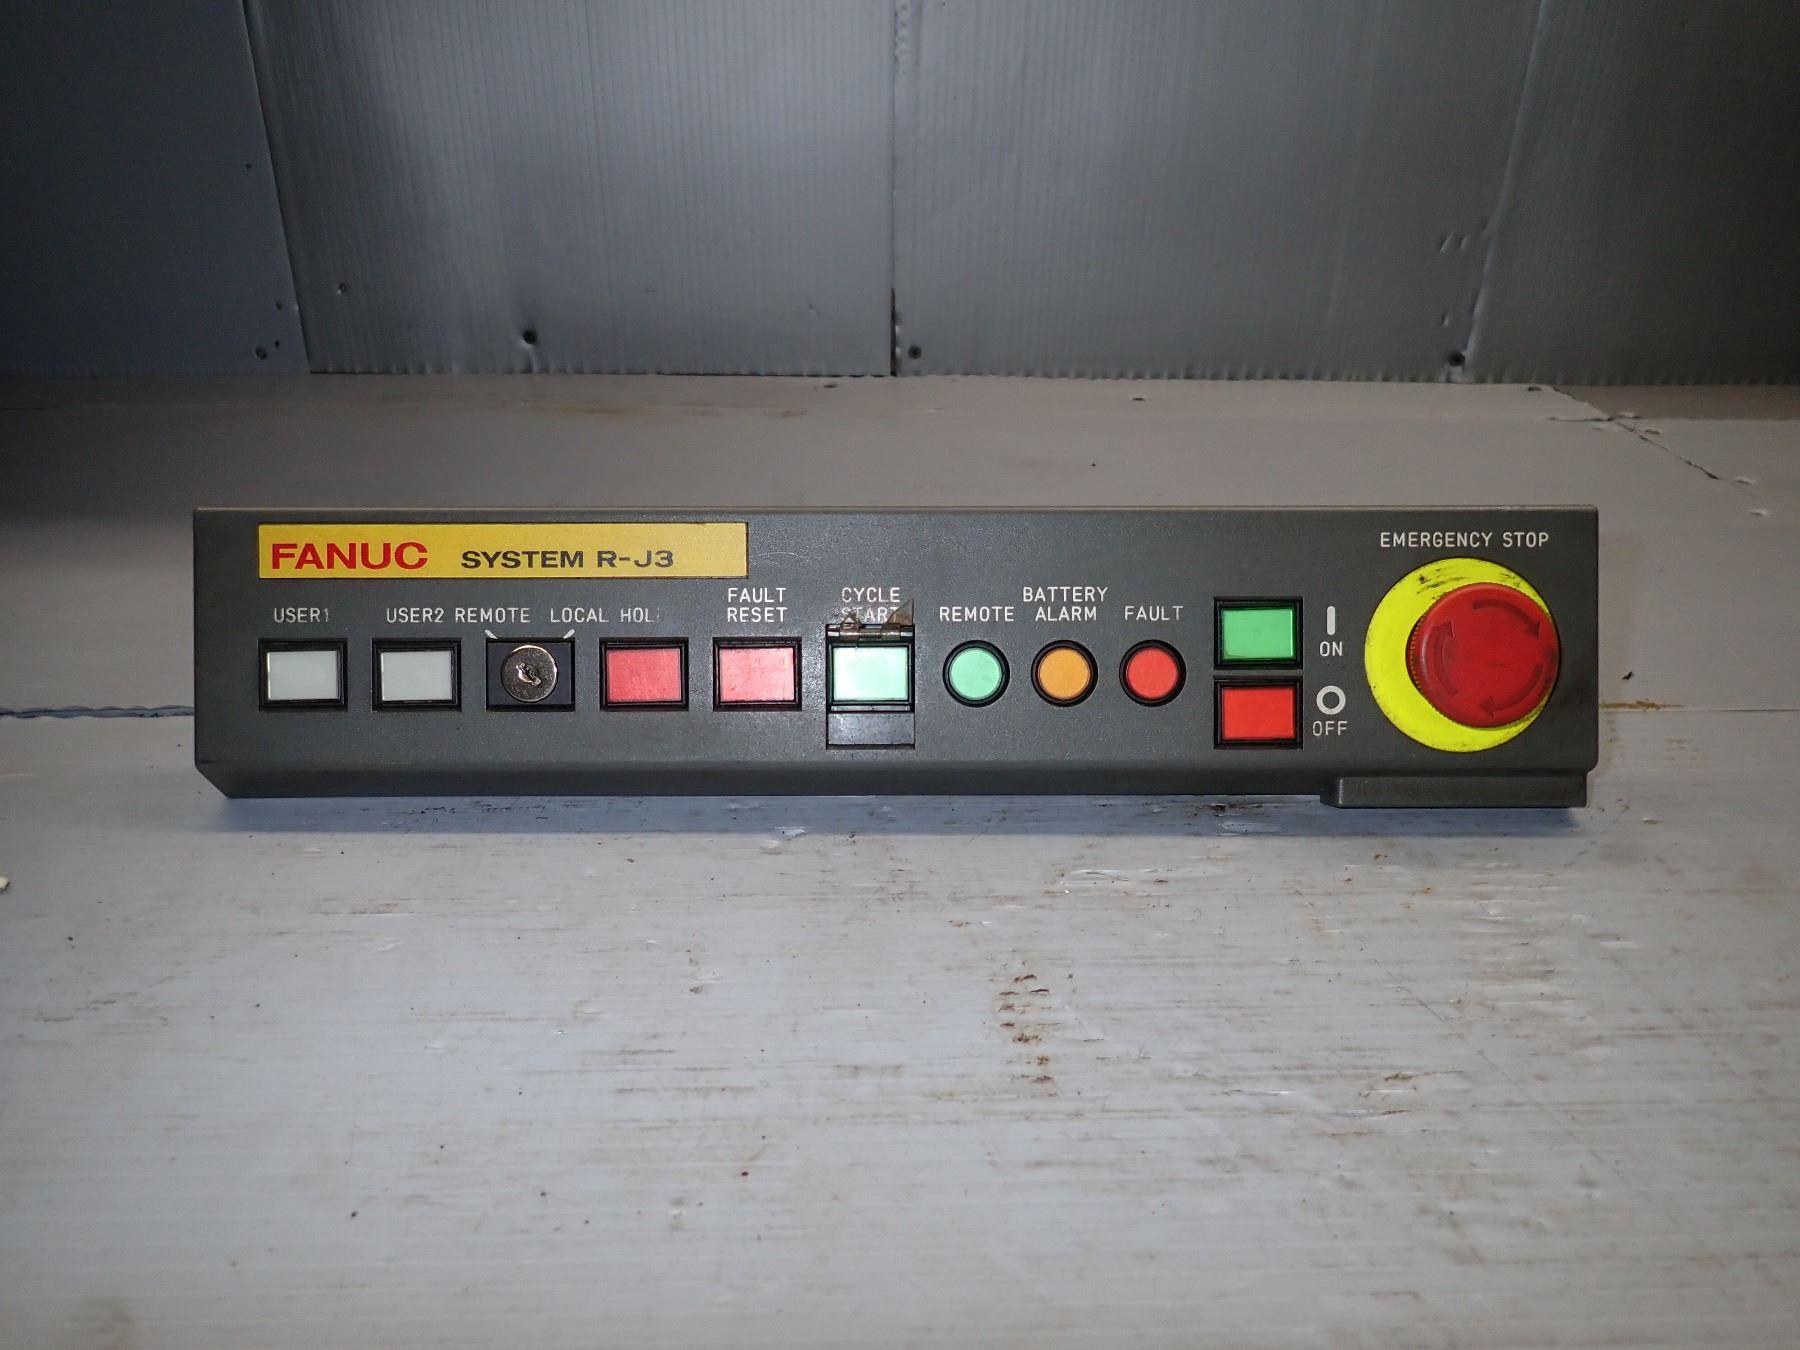 FANUC A05B-2400-C001 OPERATOR CONTROL PANEL